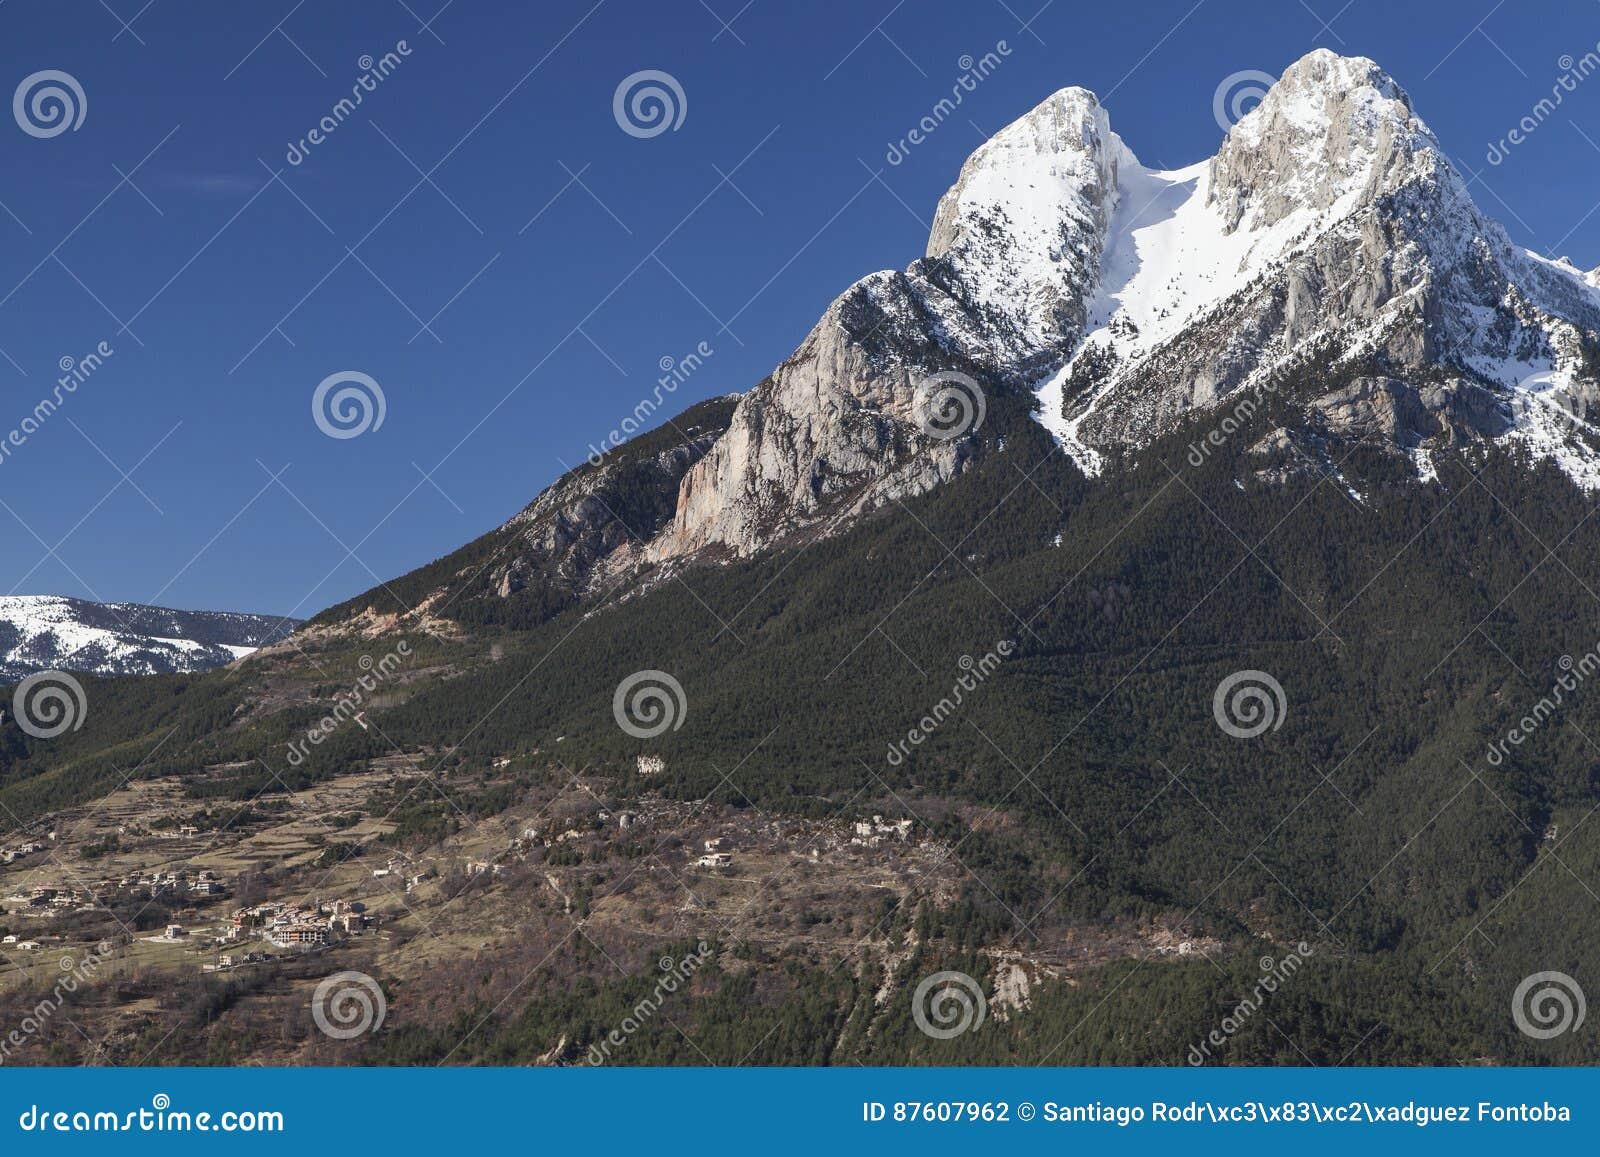 Saldes and the Pedraforca